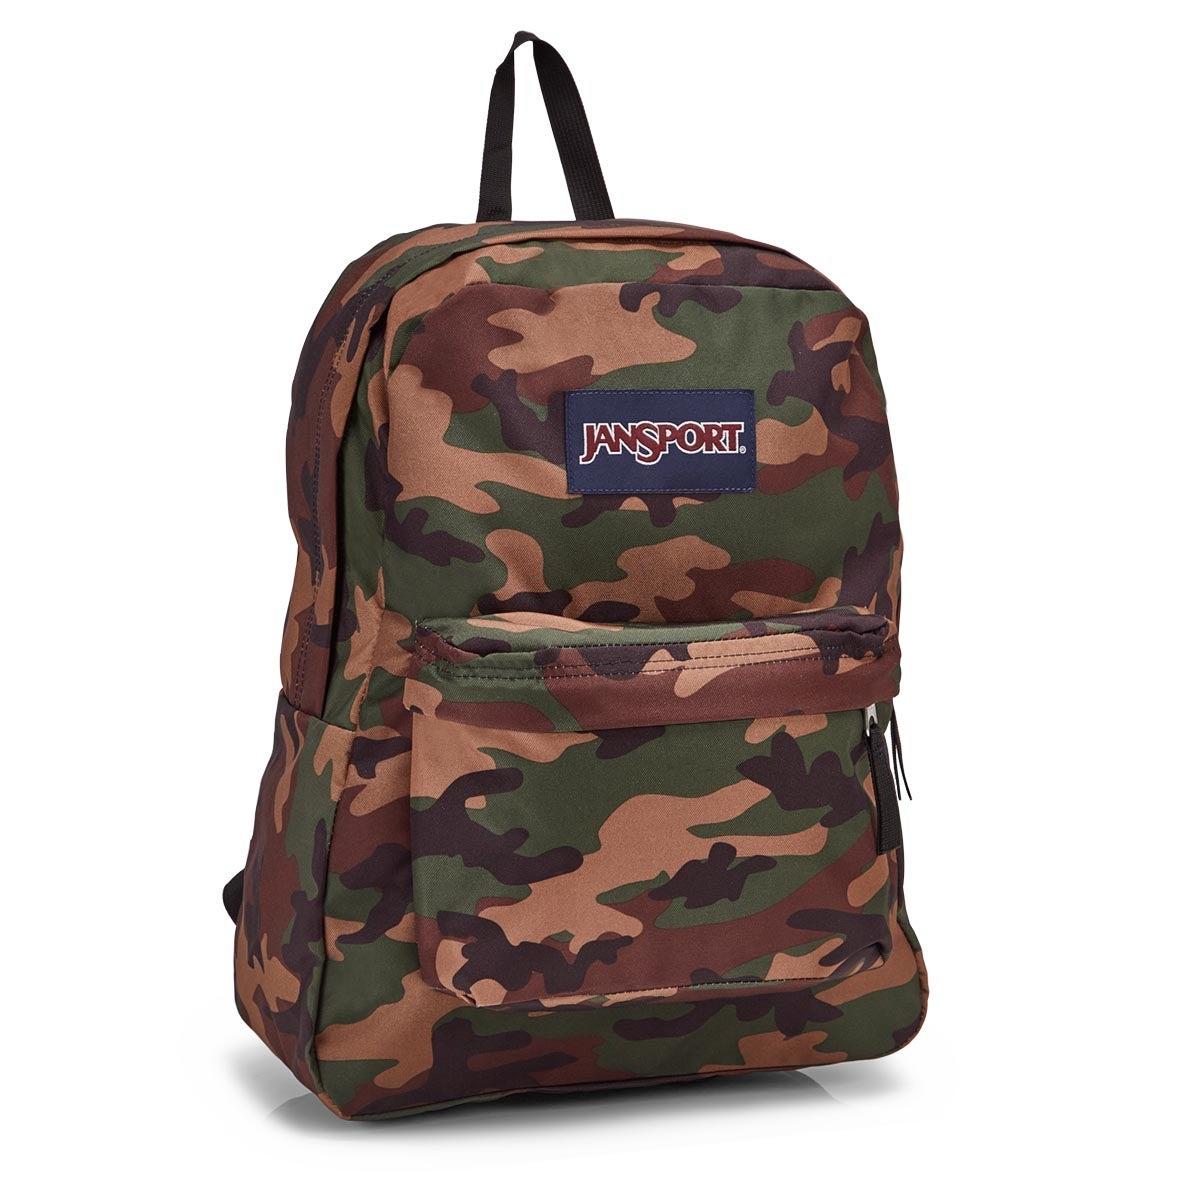 Jansport Superbreak surpls camo backpack